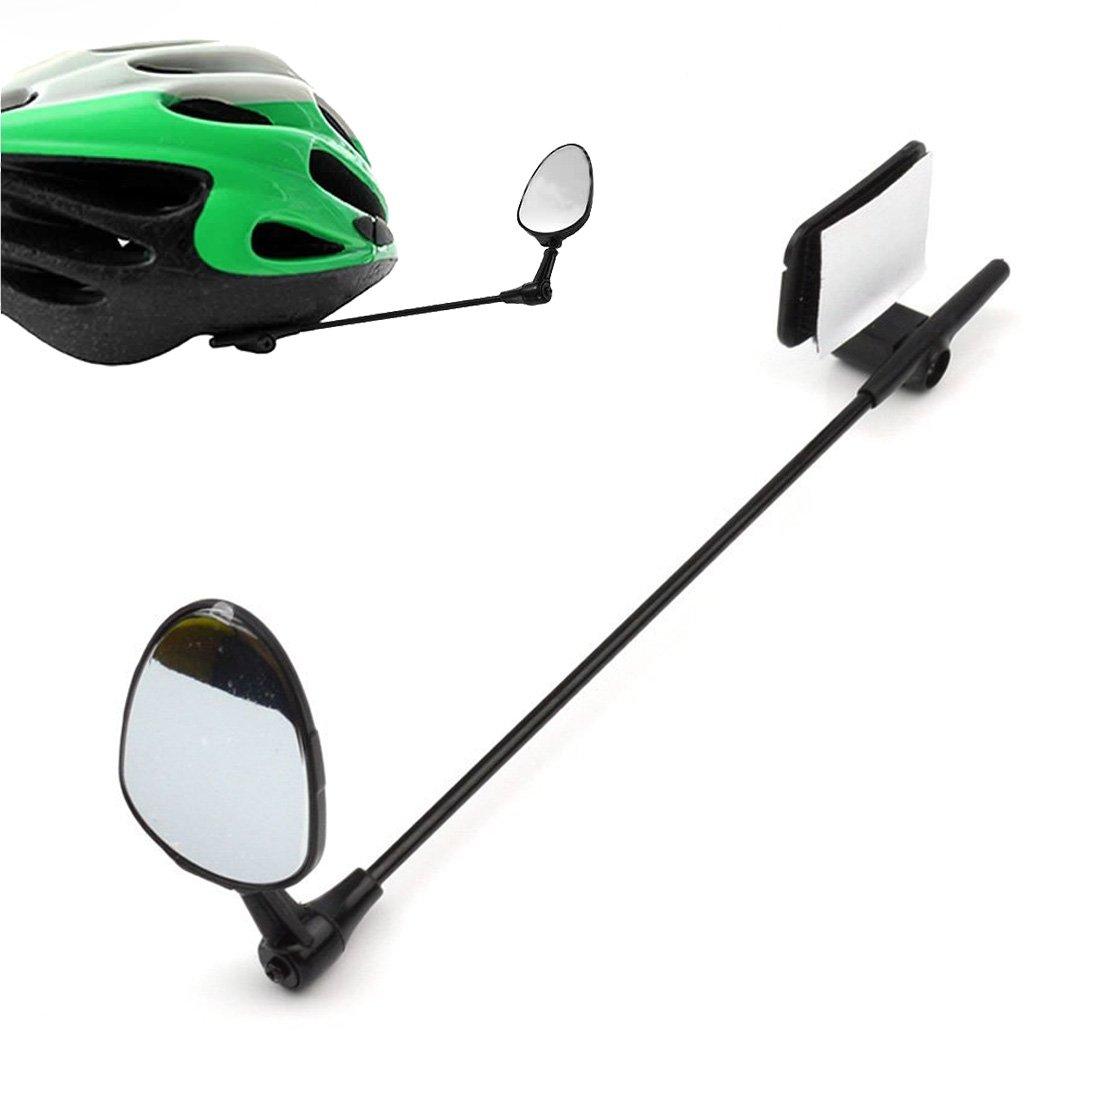 COOLWHEEL Bike Mirror For Helmet - 360 Degree Roration Adjustable Bike Helmet Mirror With Crystal Clear View - Lightweight Bike Rear View Mirror